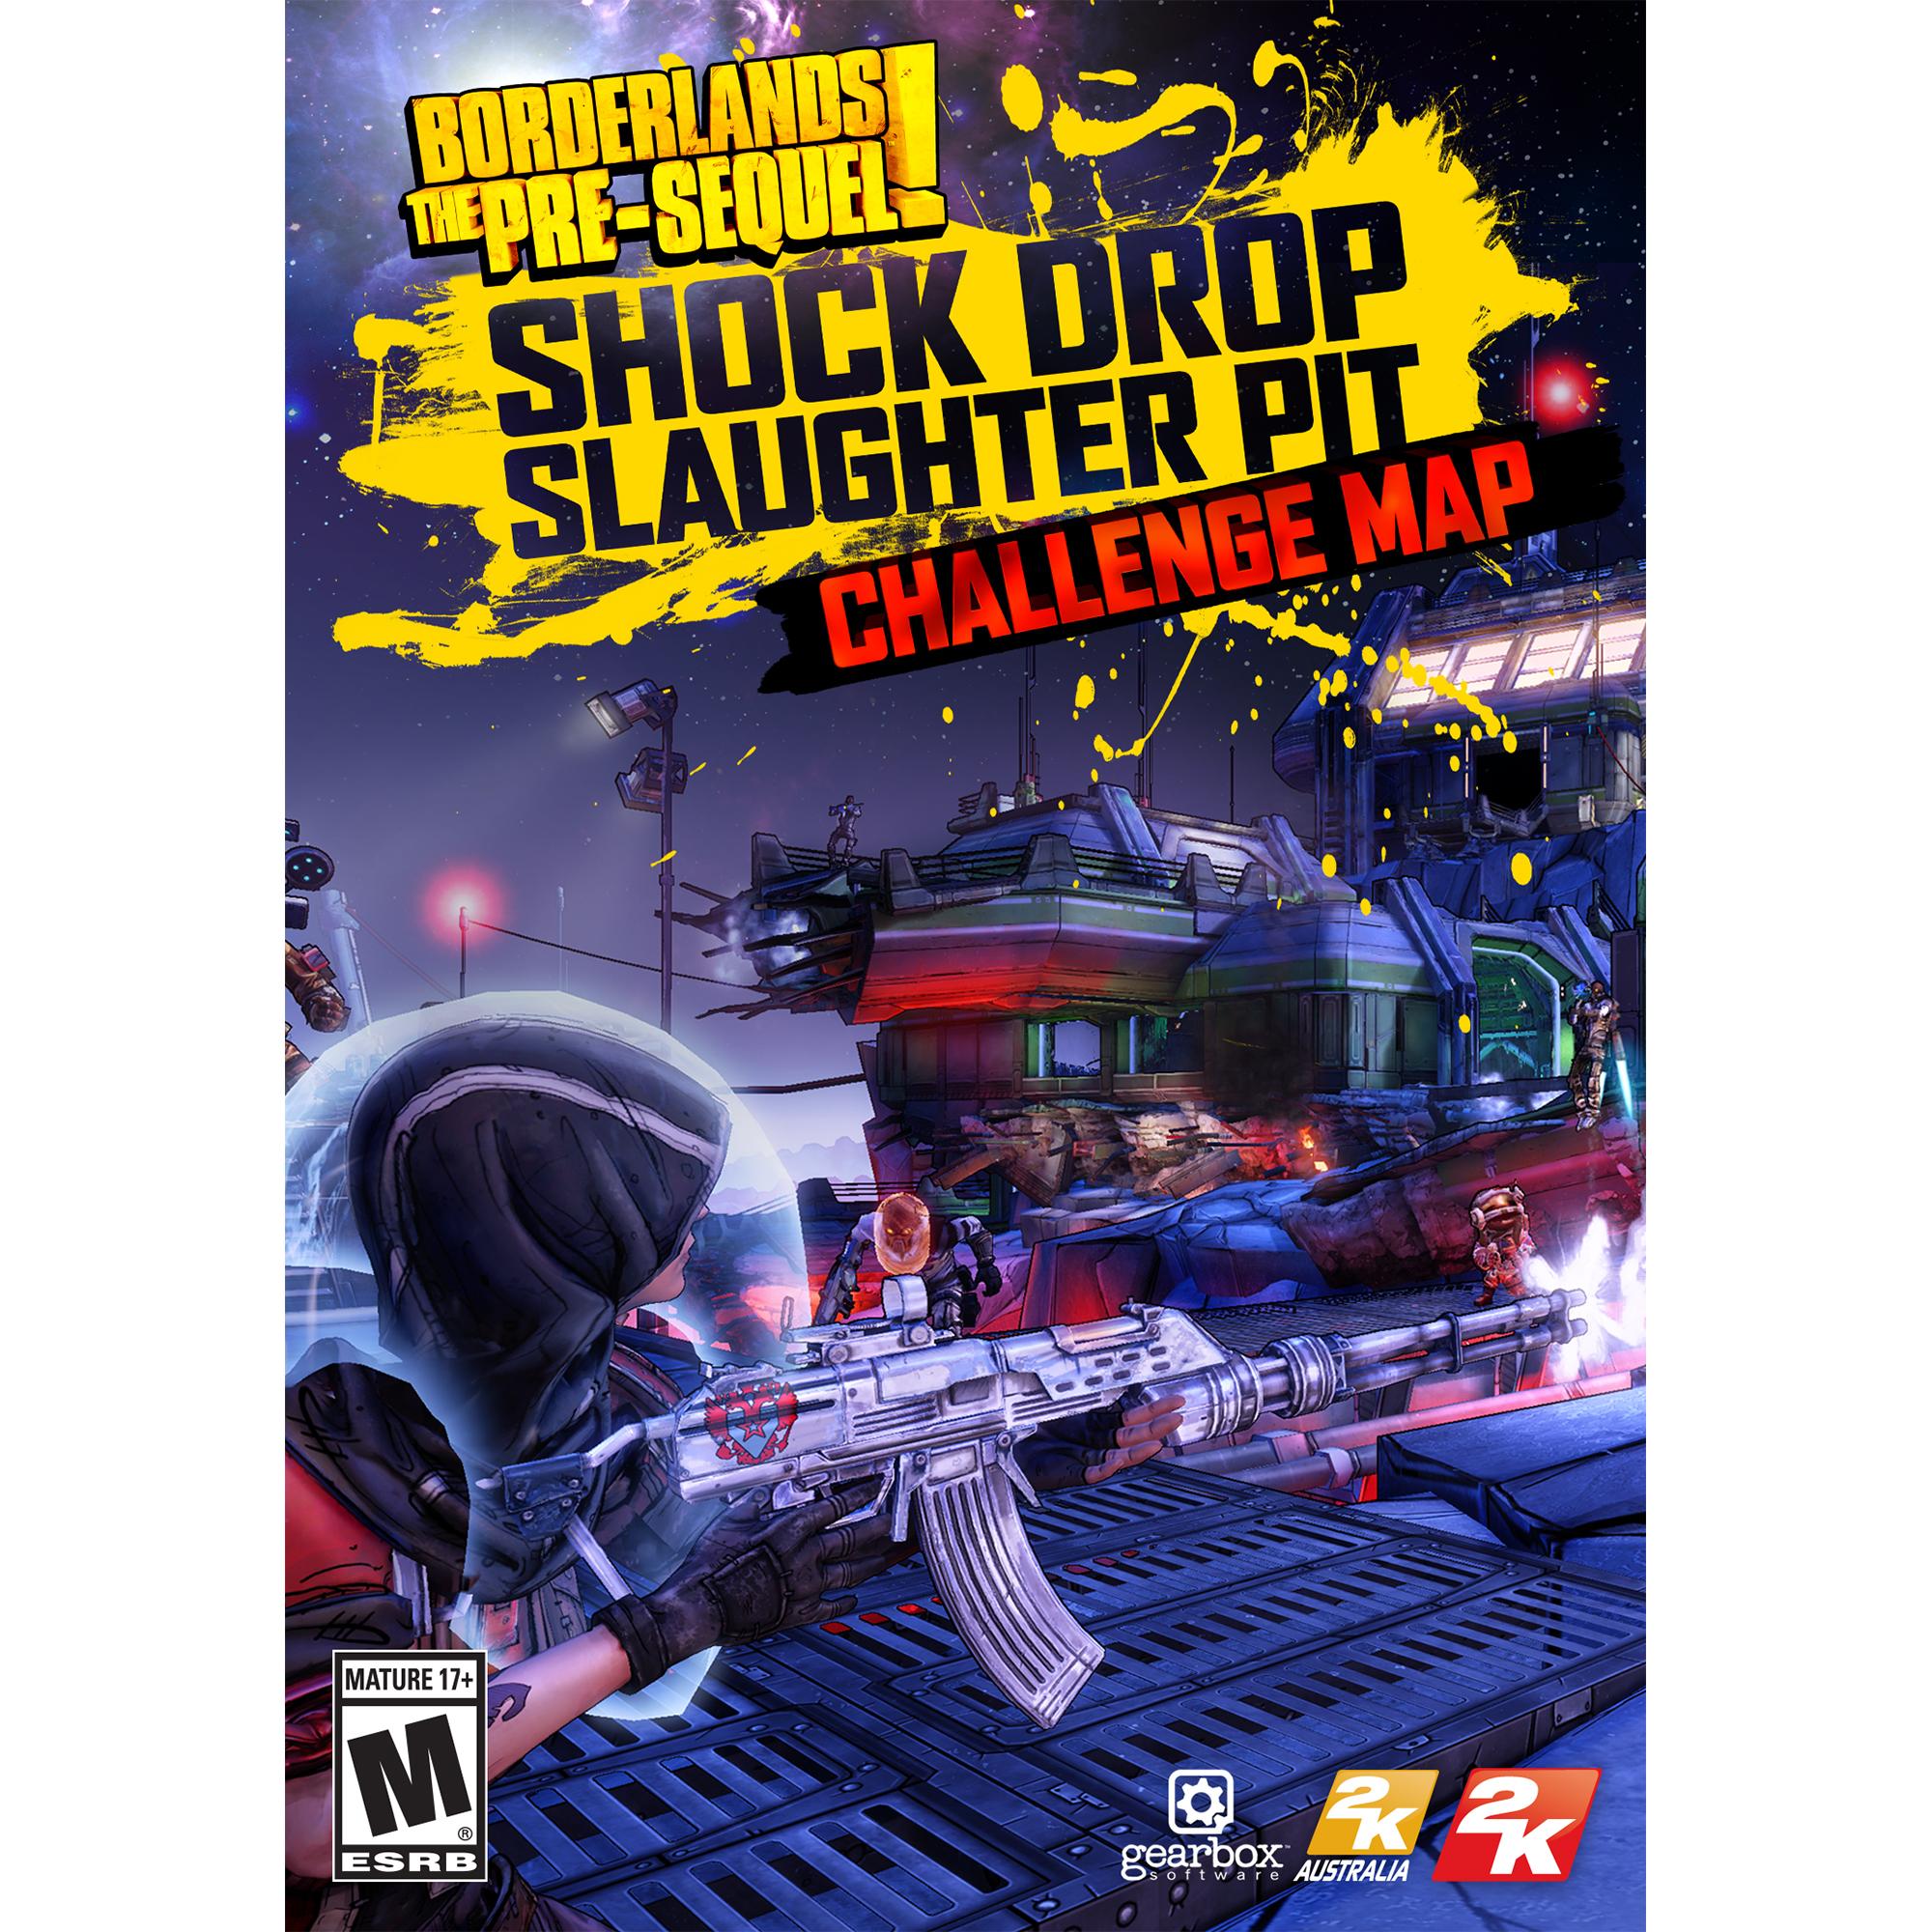 Borderlands: The Pre-Sequel - Shock Drop Slaughter Pit (PC)(Digital Download)